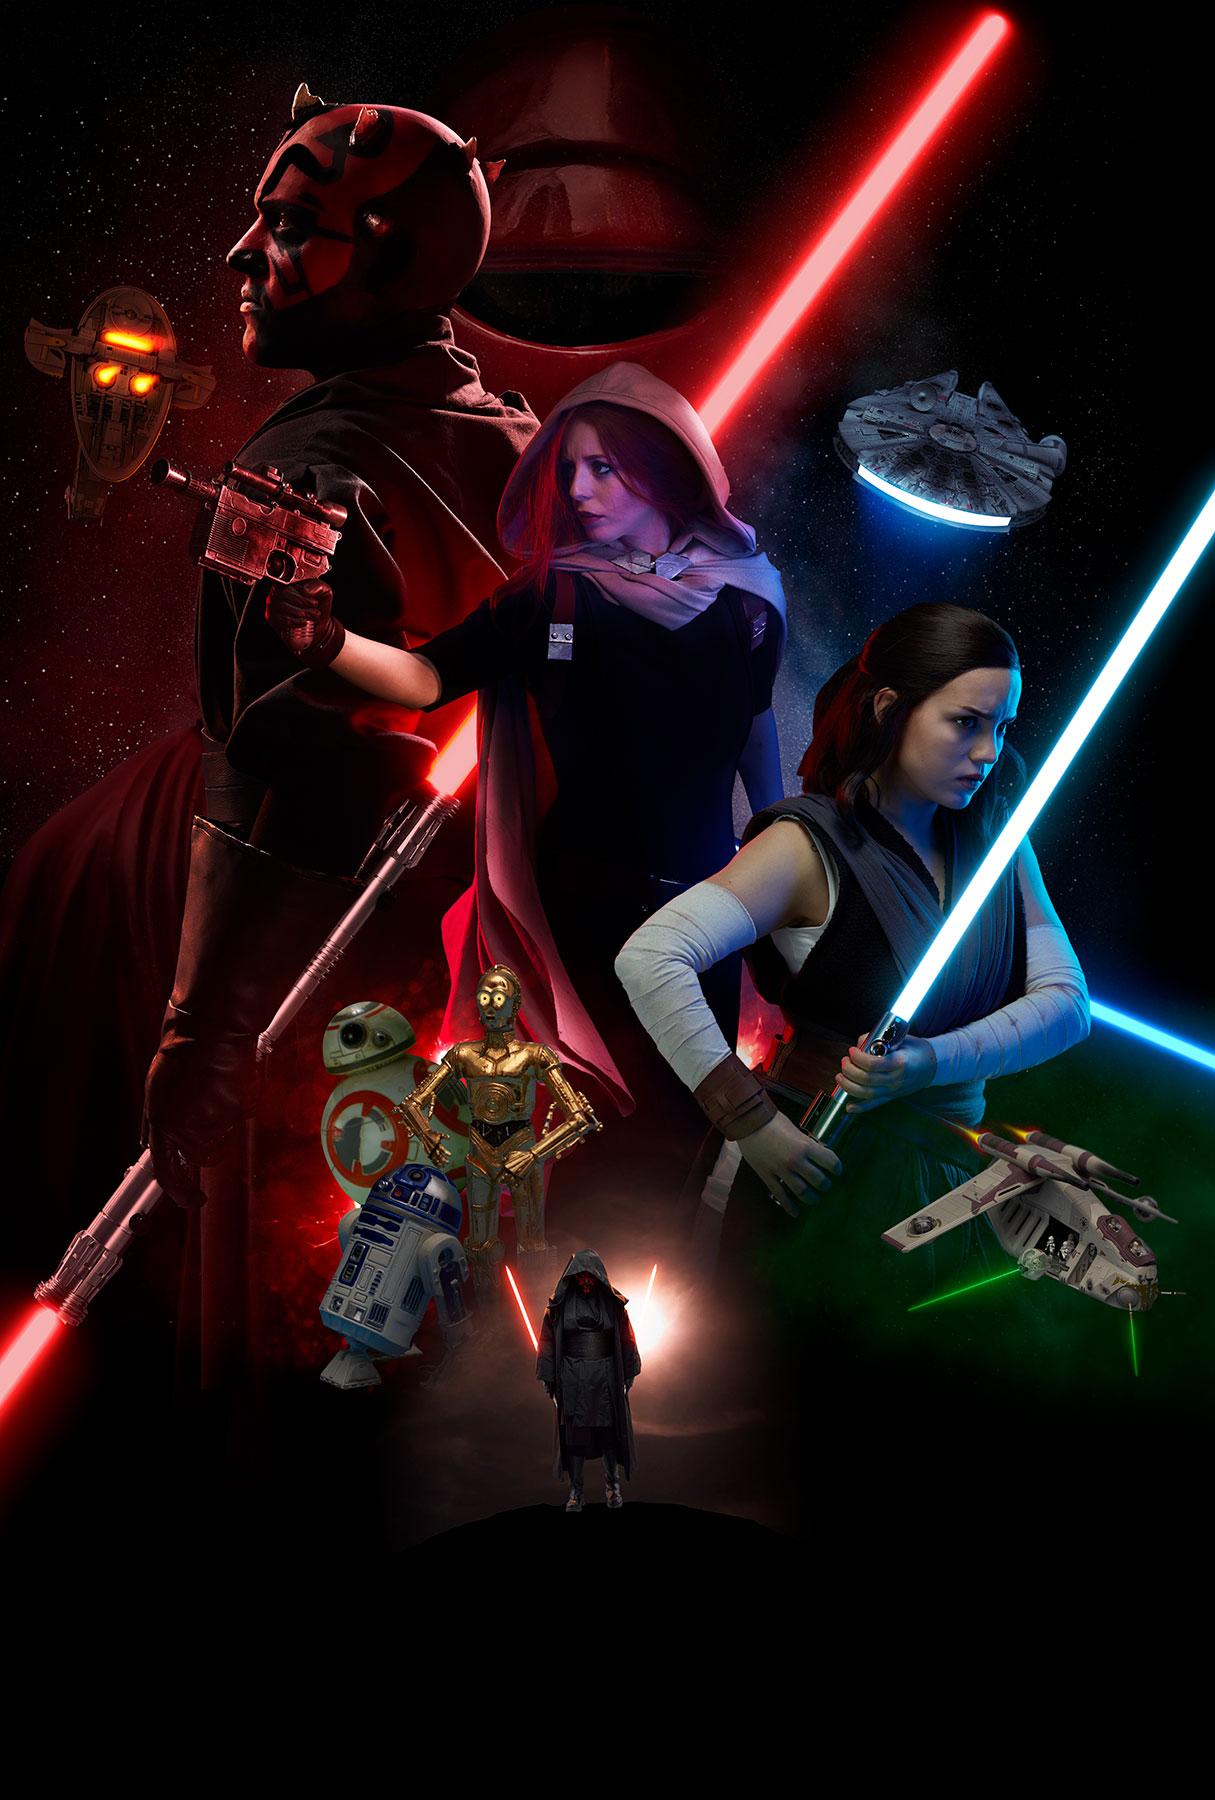 Sayanoff Arthur Star Wars Poster 02 08